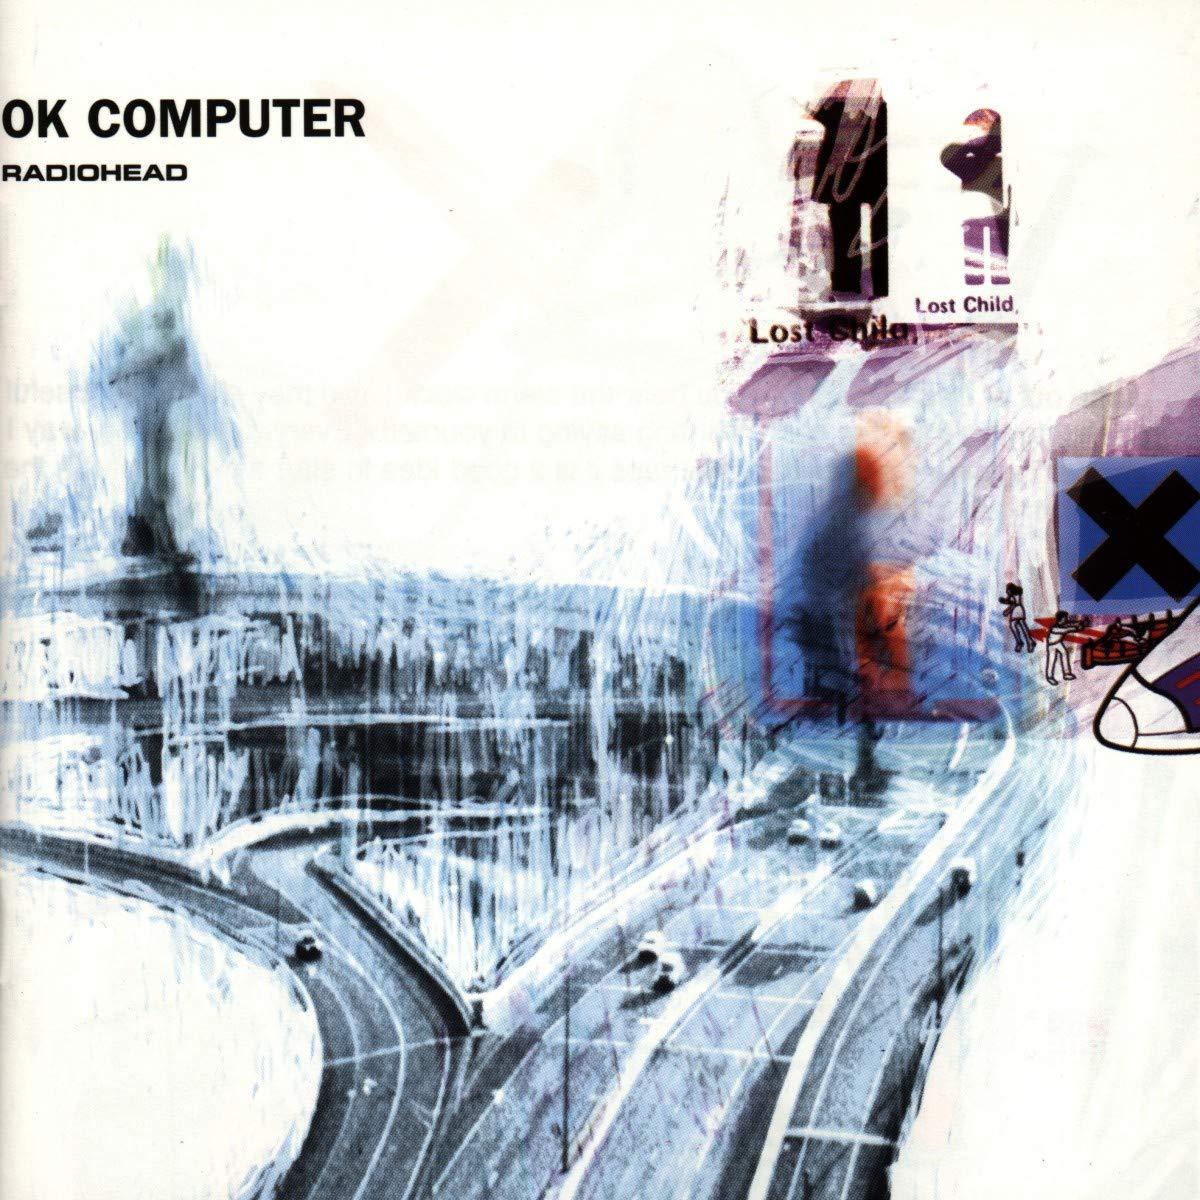 Radiohead - OK Computer - Amazon.com Music